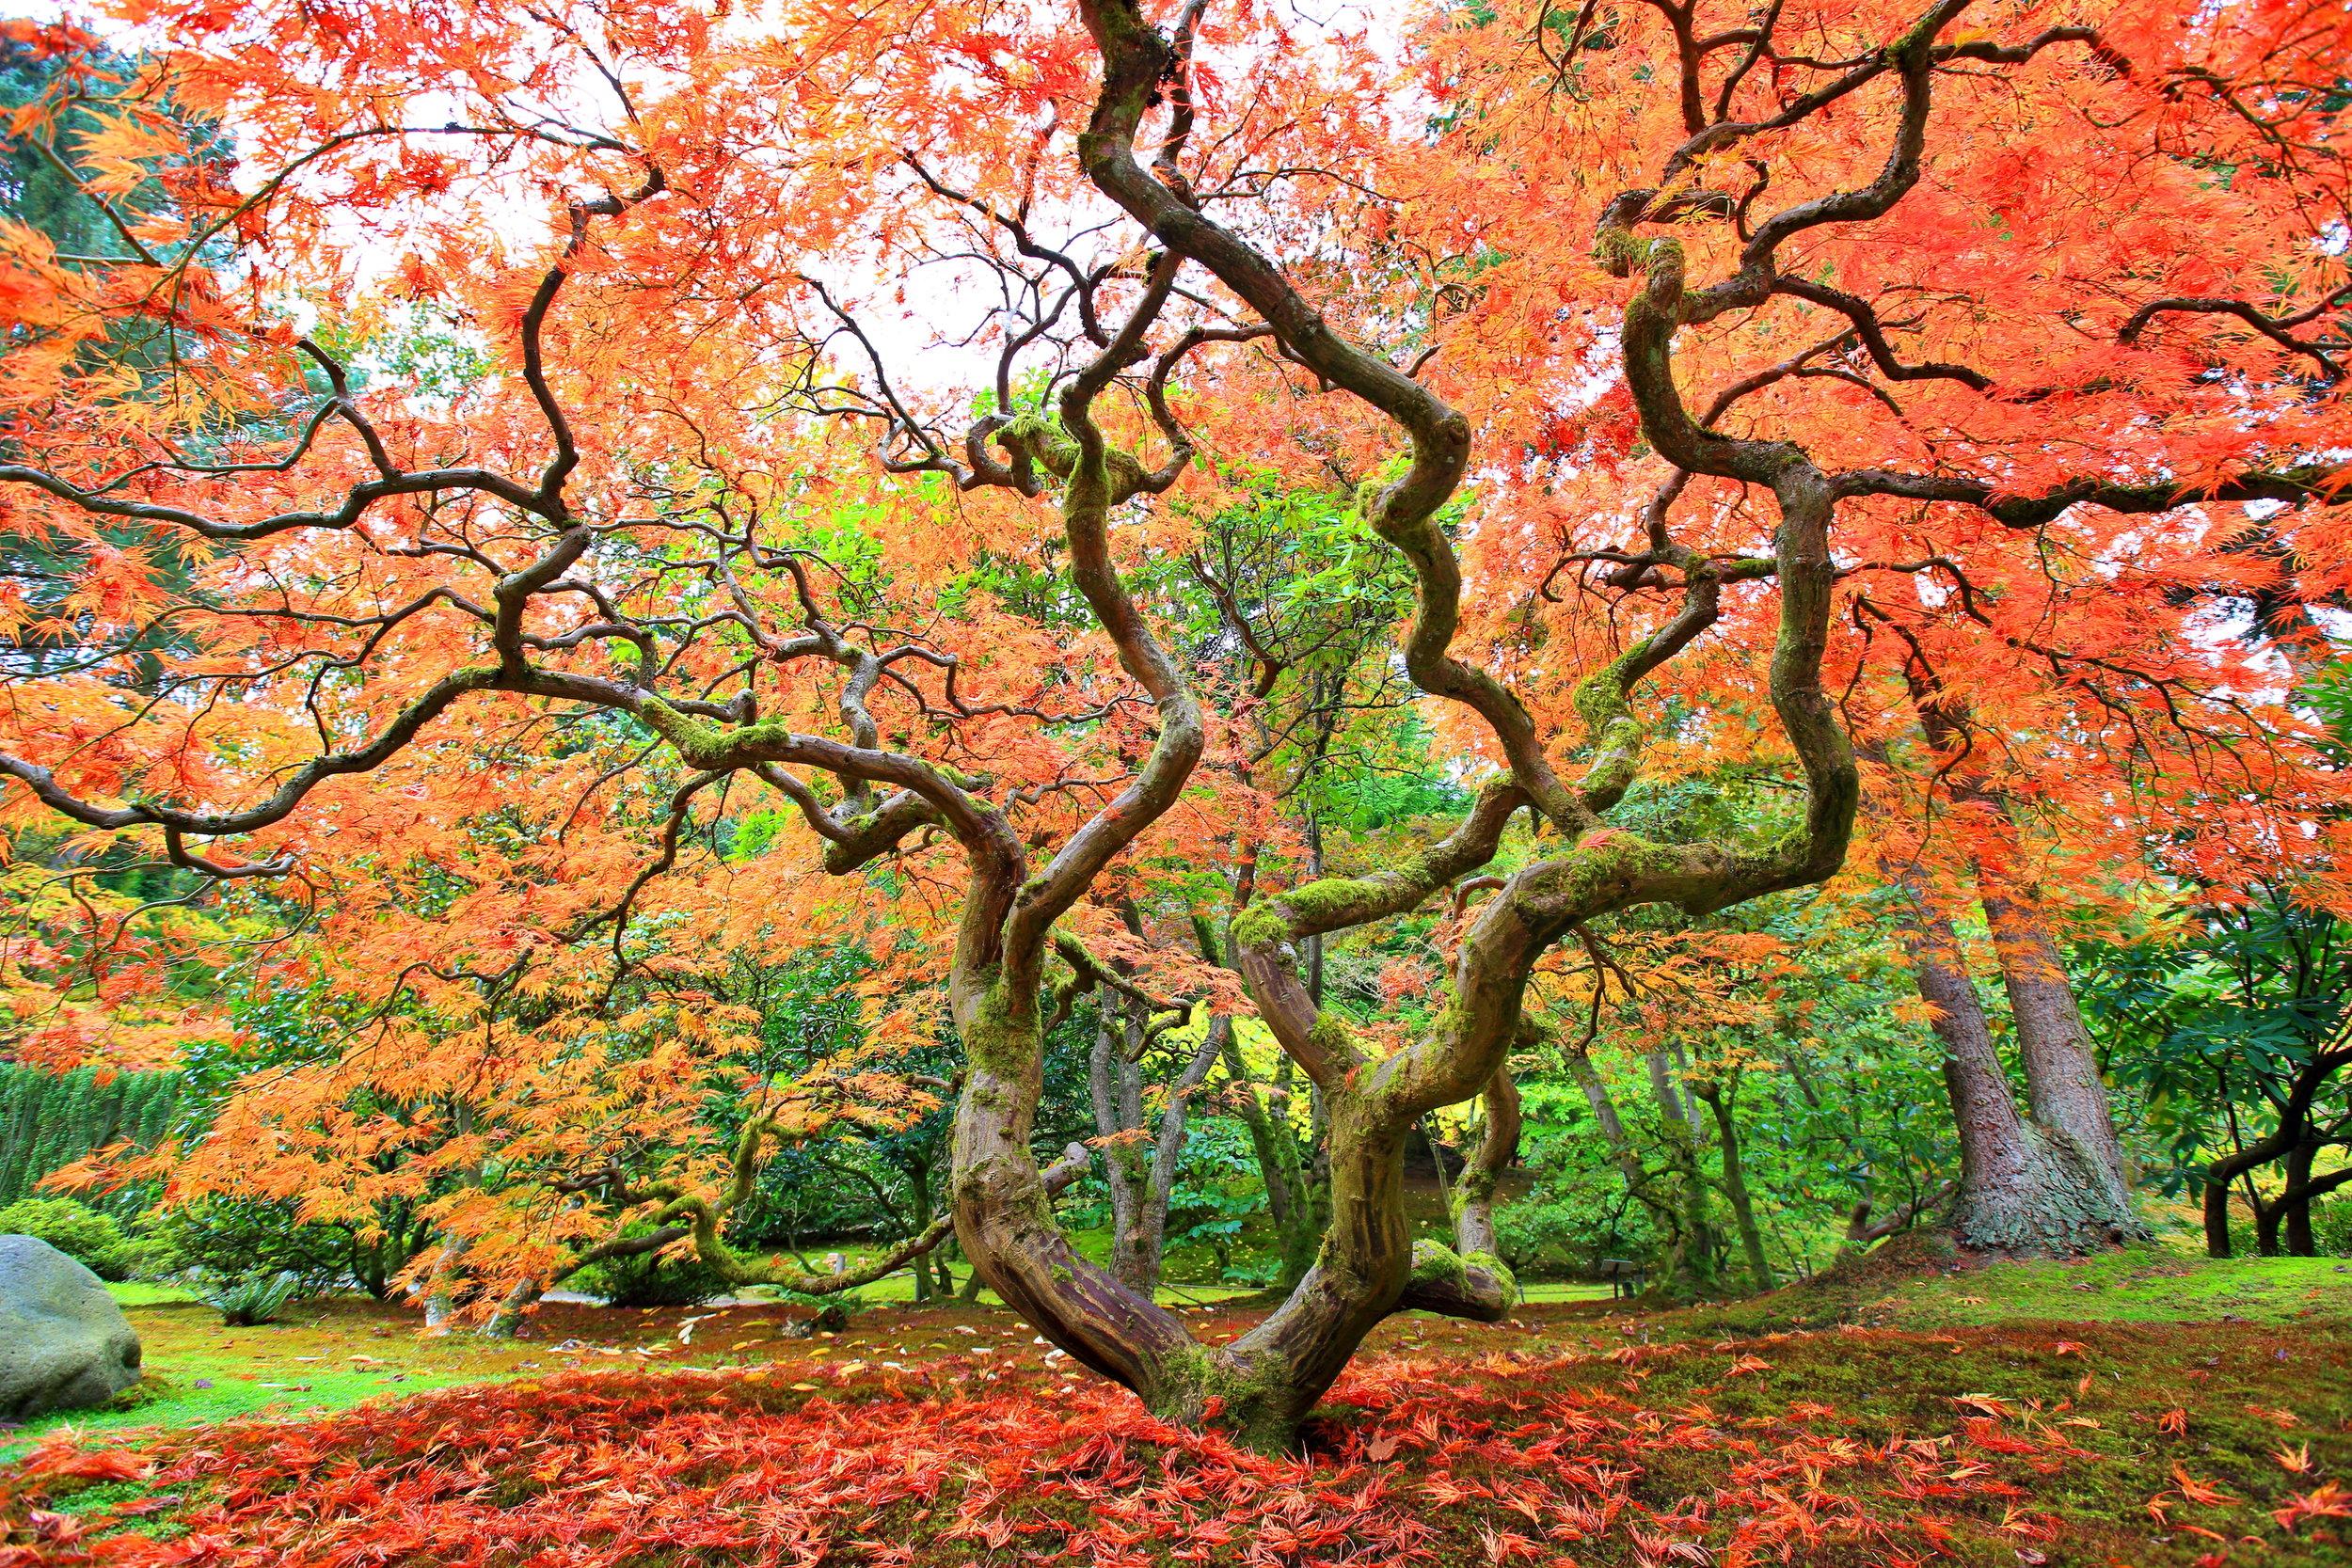 Autum maple crooked tree copy.jpg